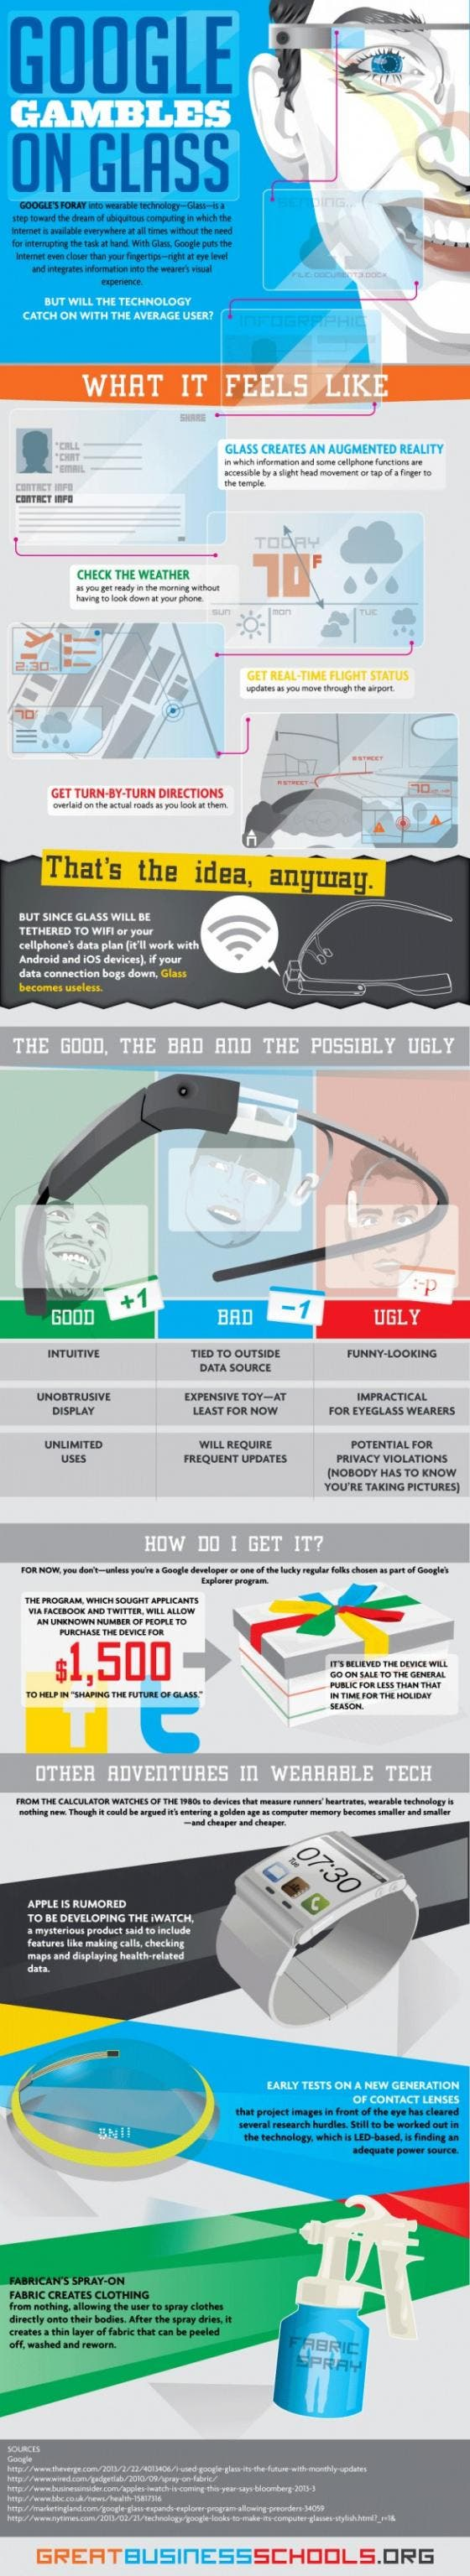 Google Gambles on Glass